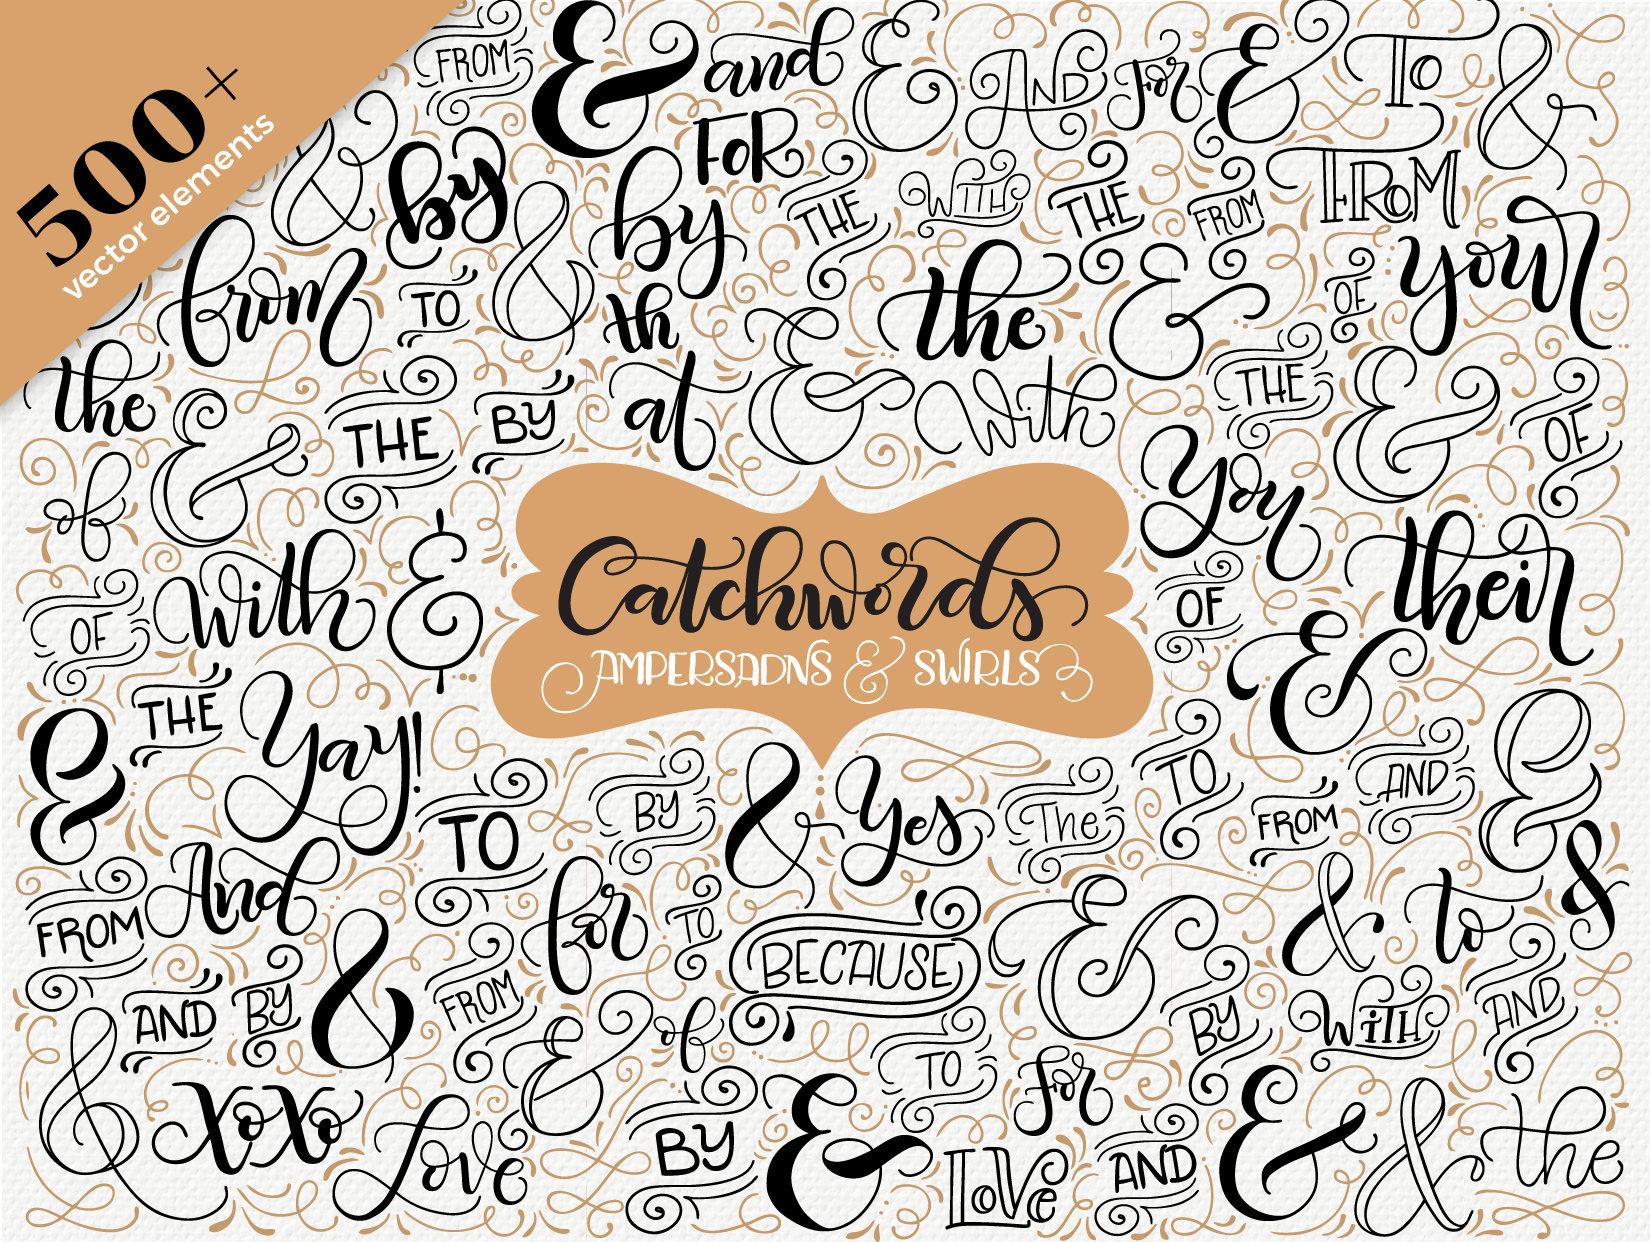 Catchwords, ampersands & swirls - Vector resources invitations - Wedding invitations resources 933d95